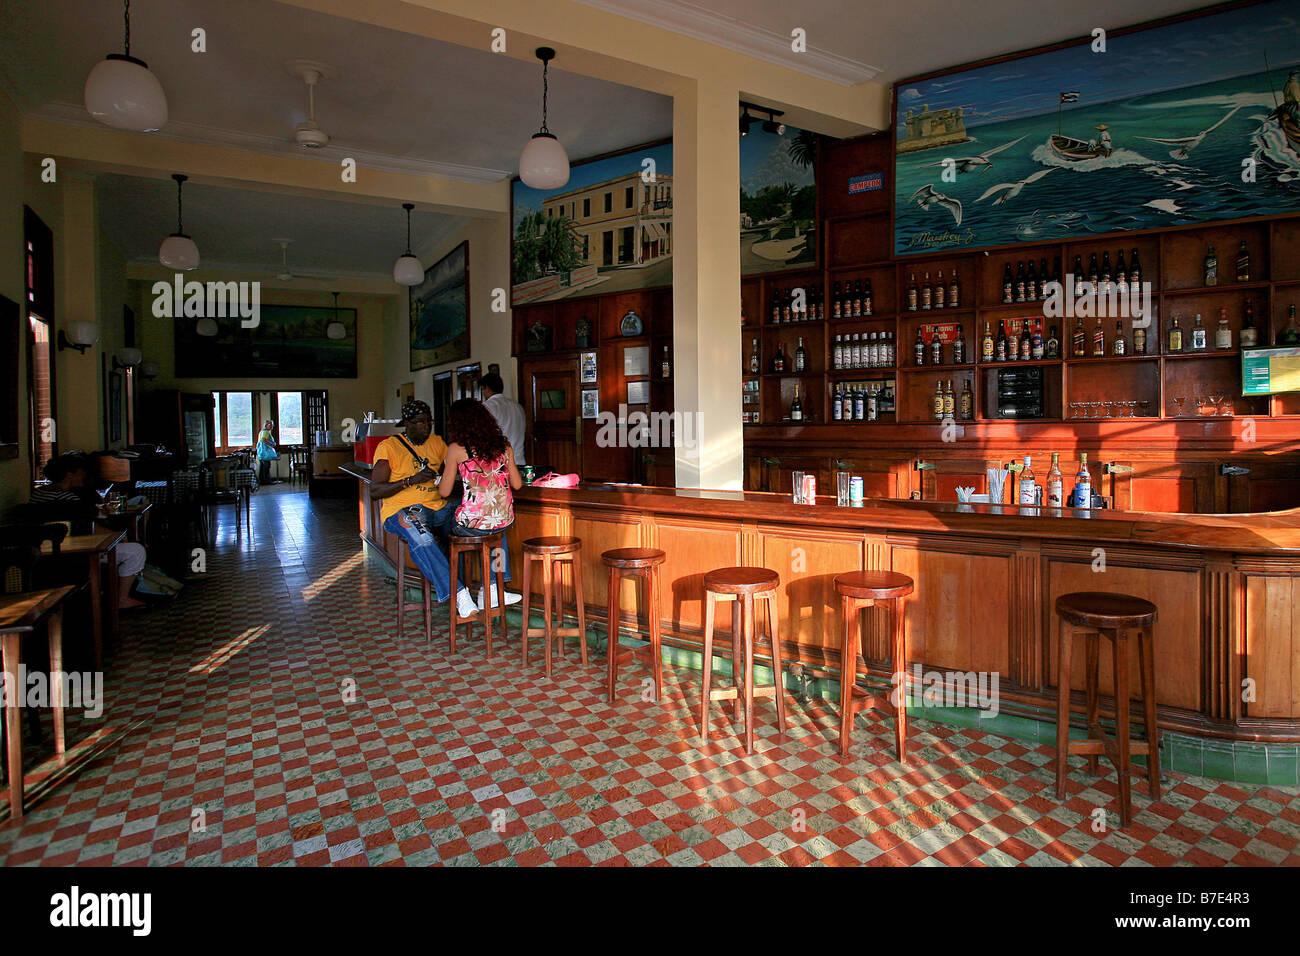 Cuba Cojimar Restaurant La Terraza Stock Photos Cuba